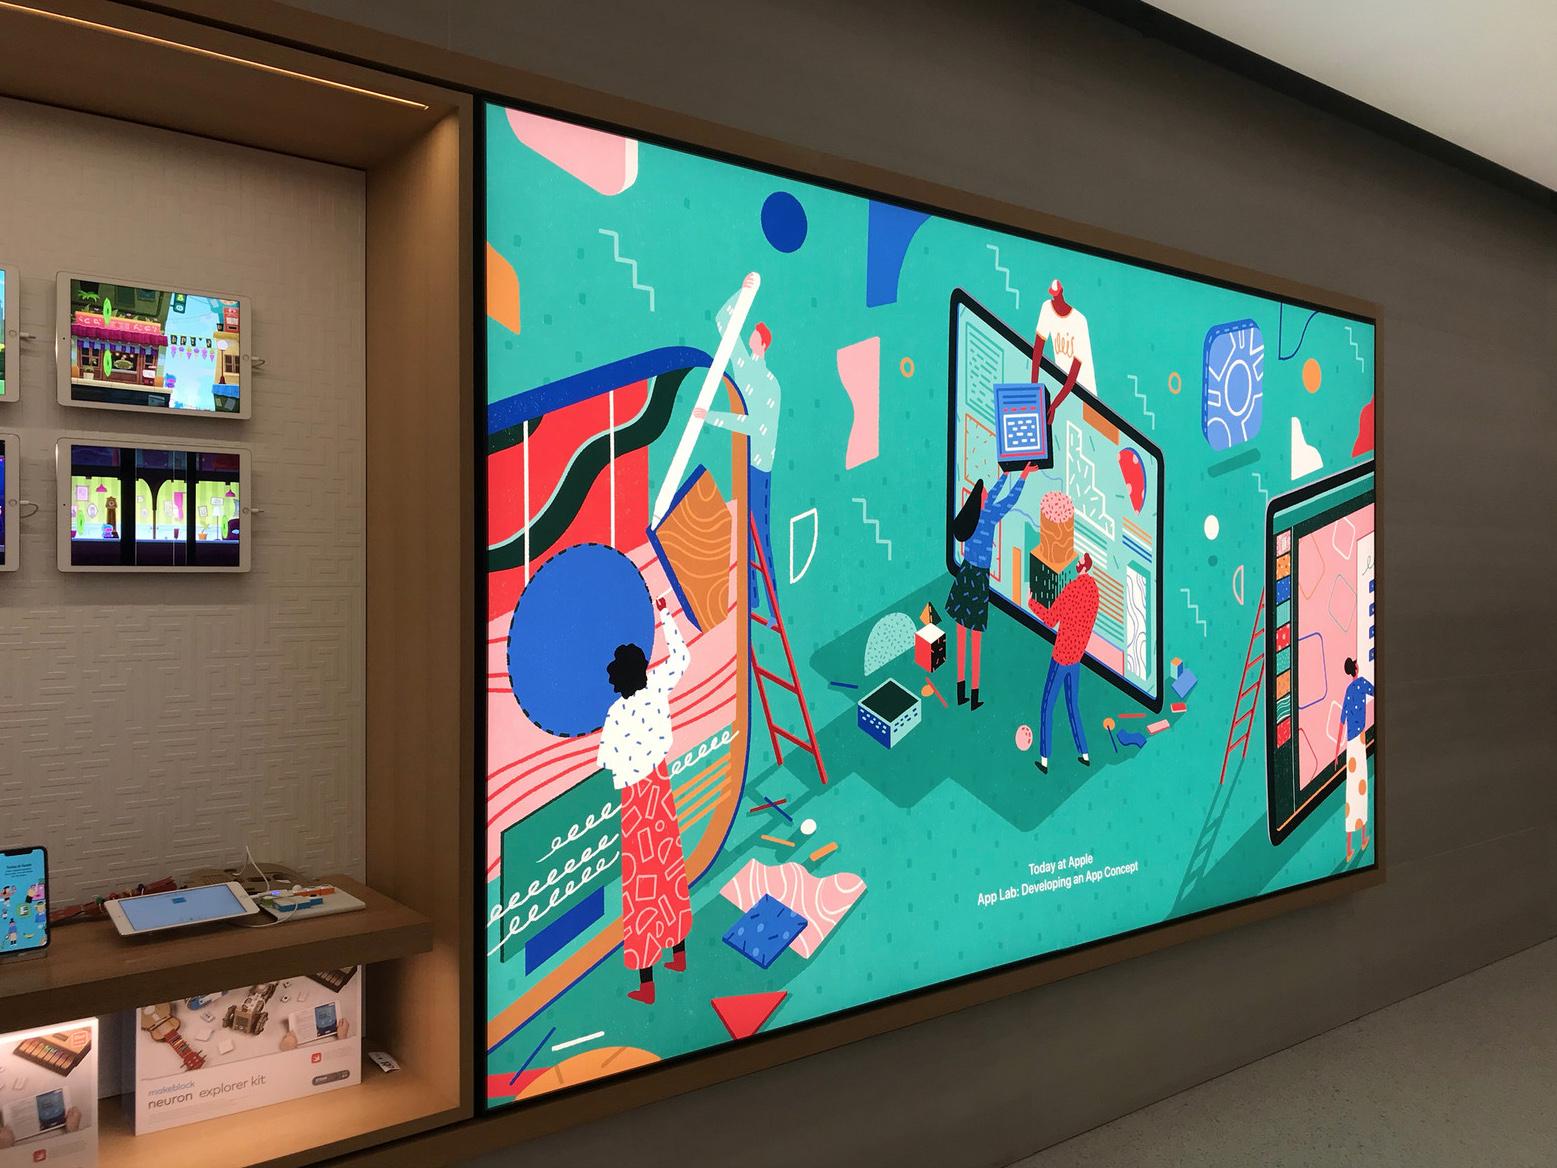 Yukai's illustrations on full display in London's Regent Street Apple Store.